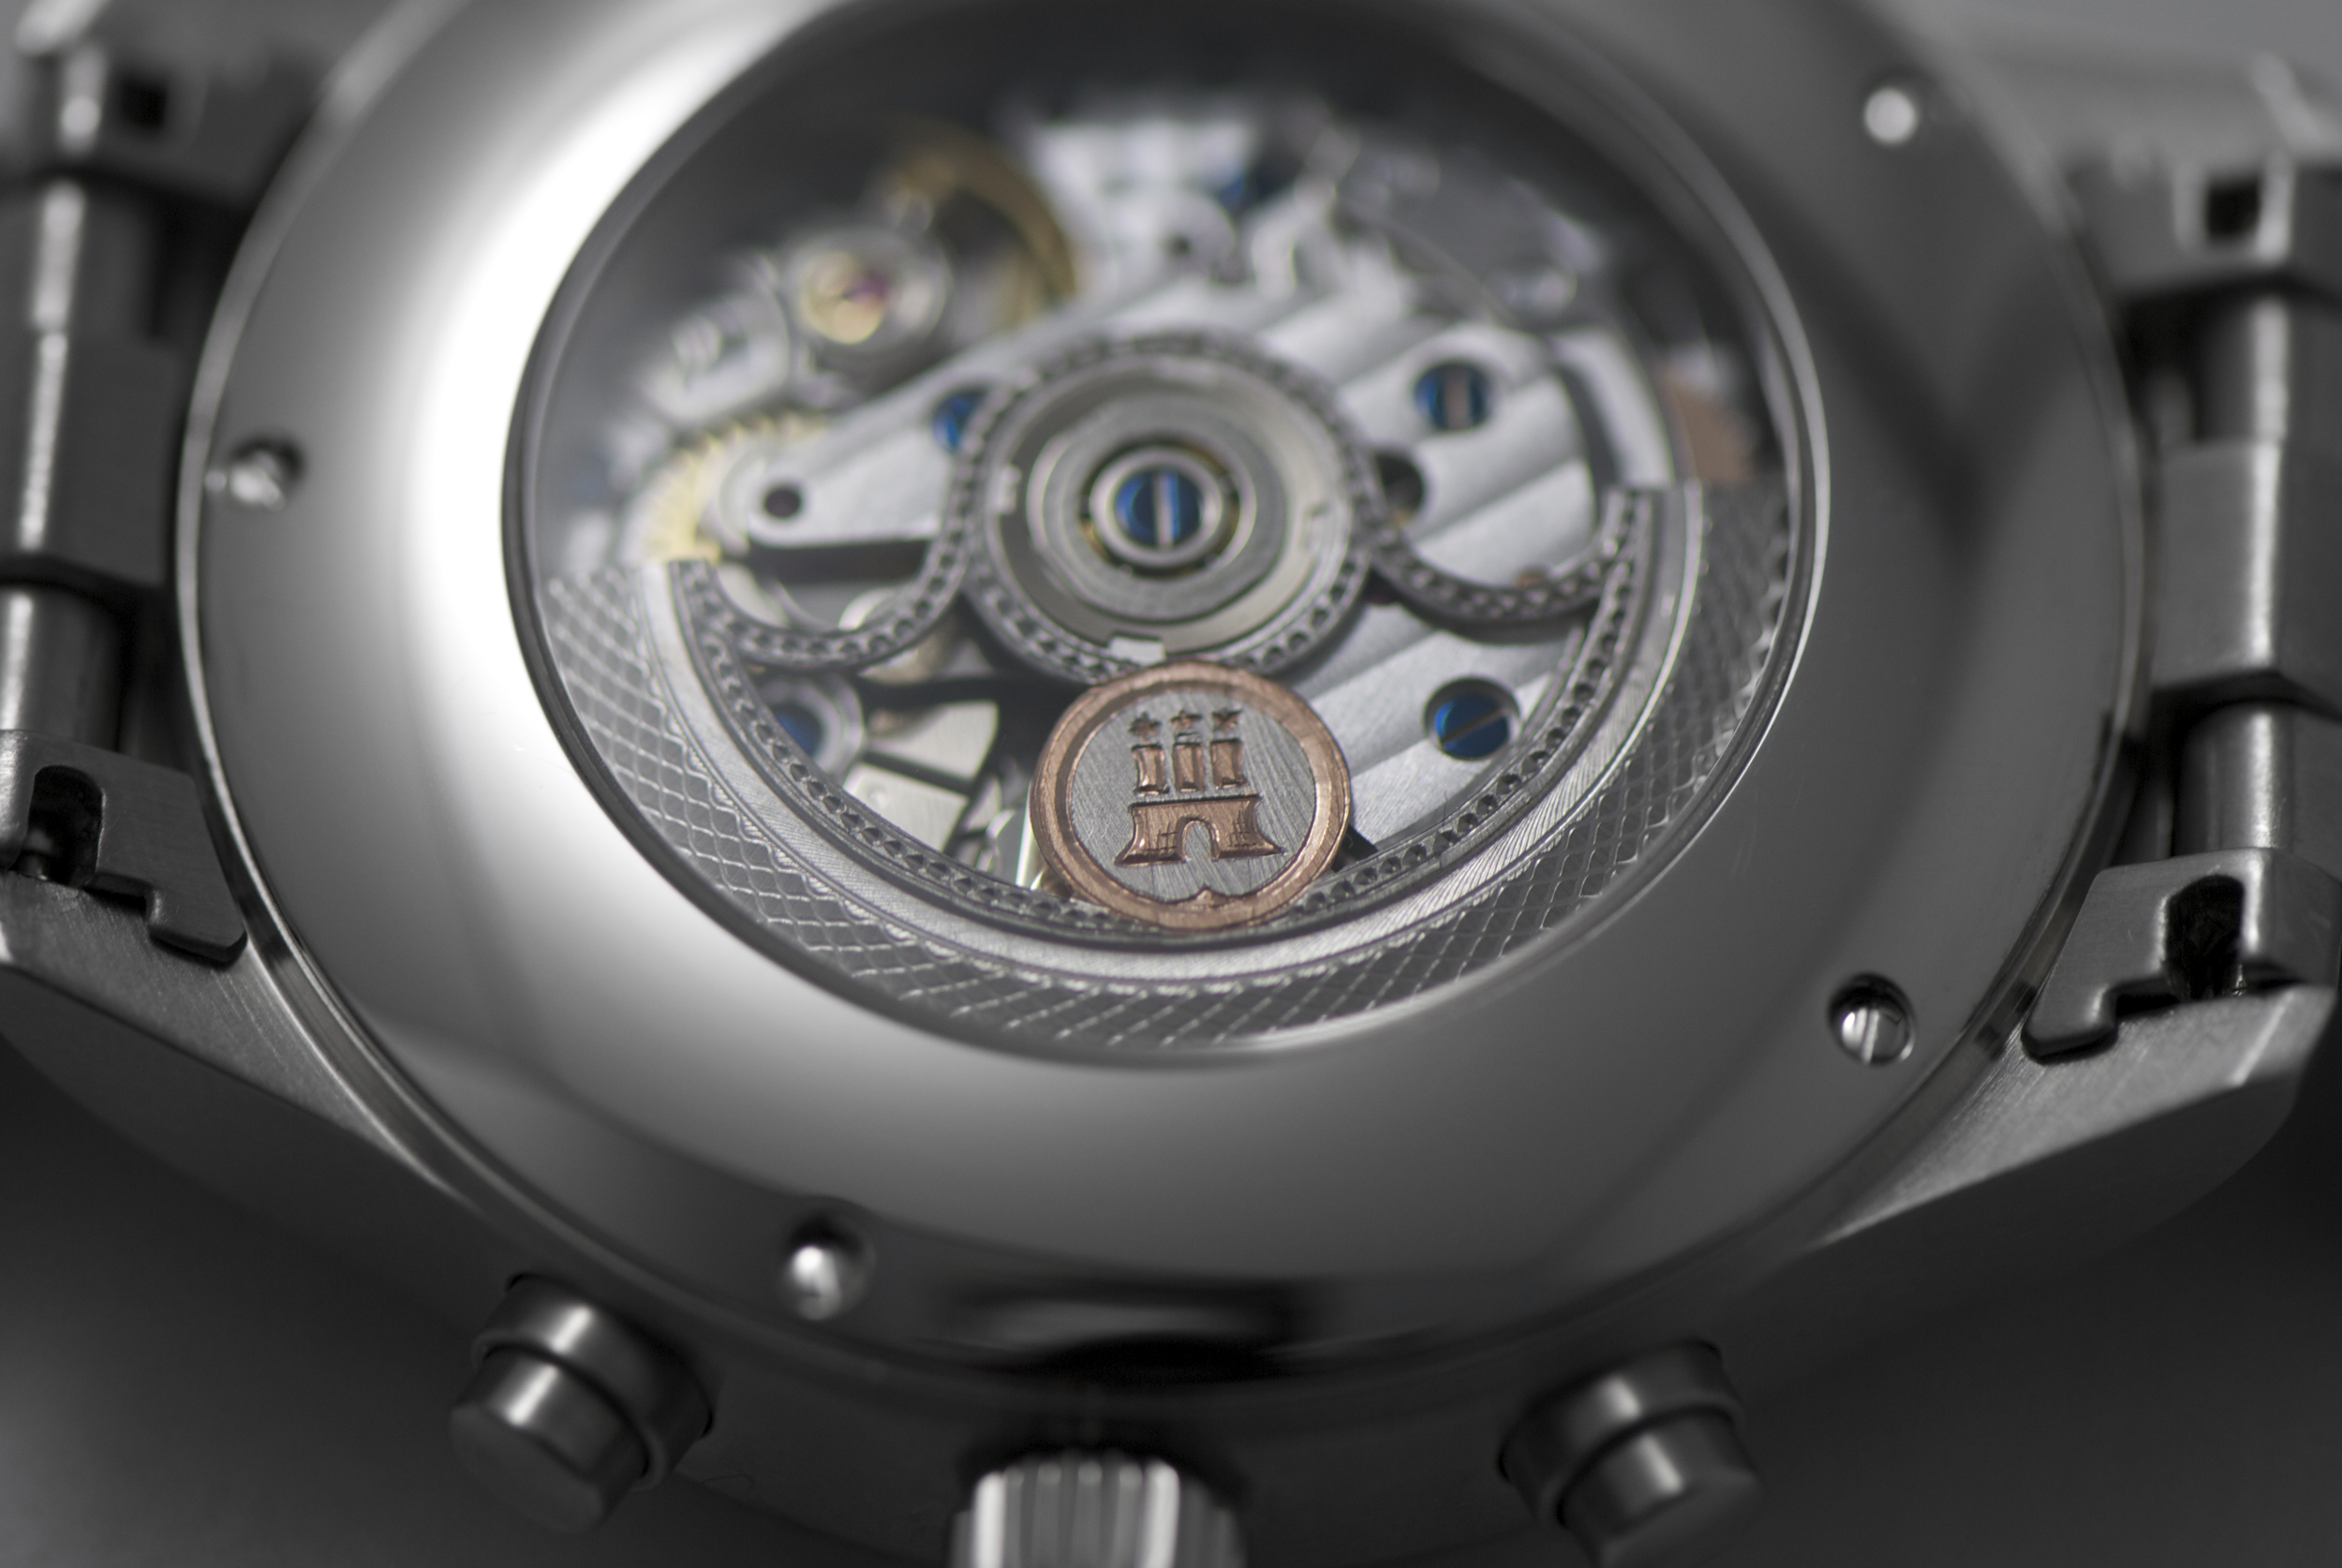 Uhrenmanufaktur Hamburg Uhrwerk Veredlung